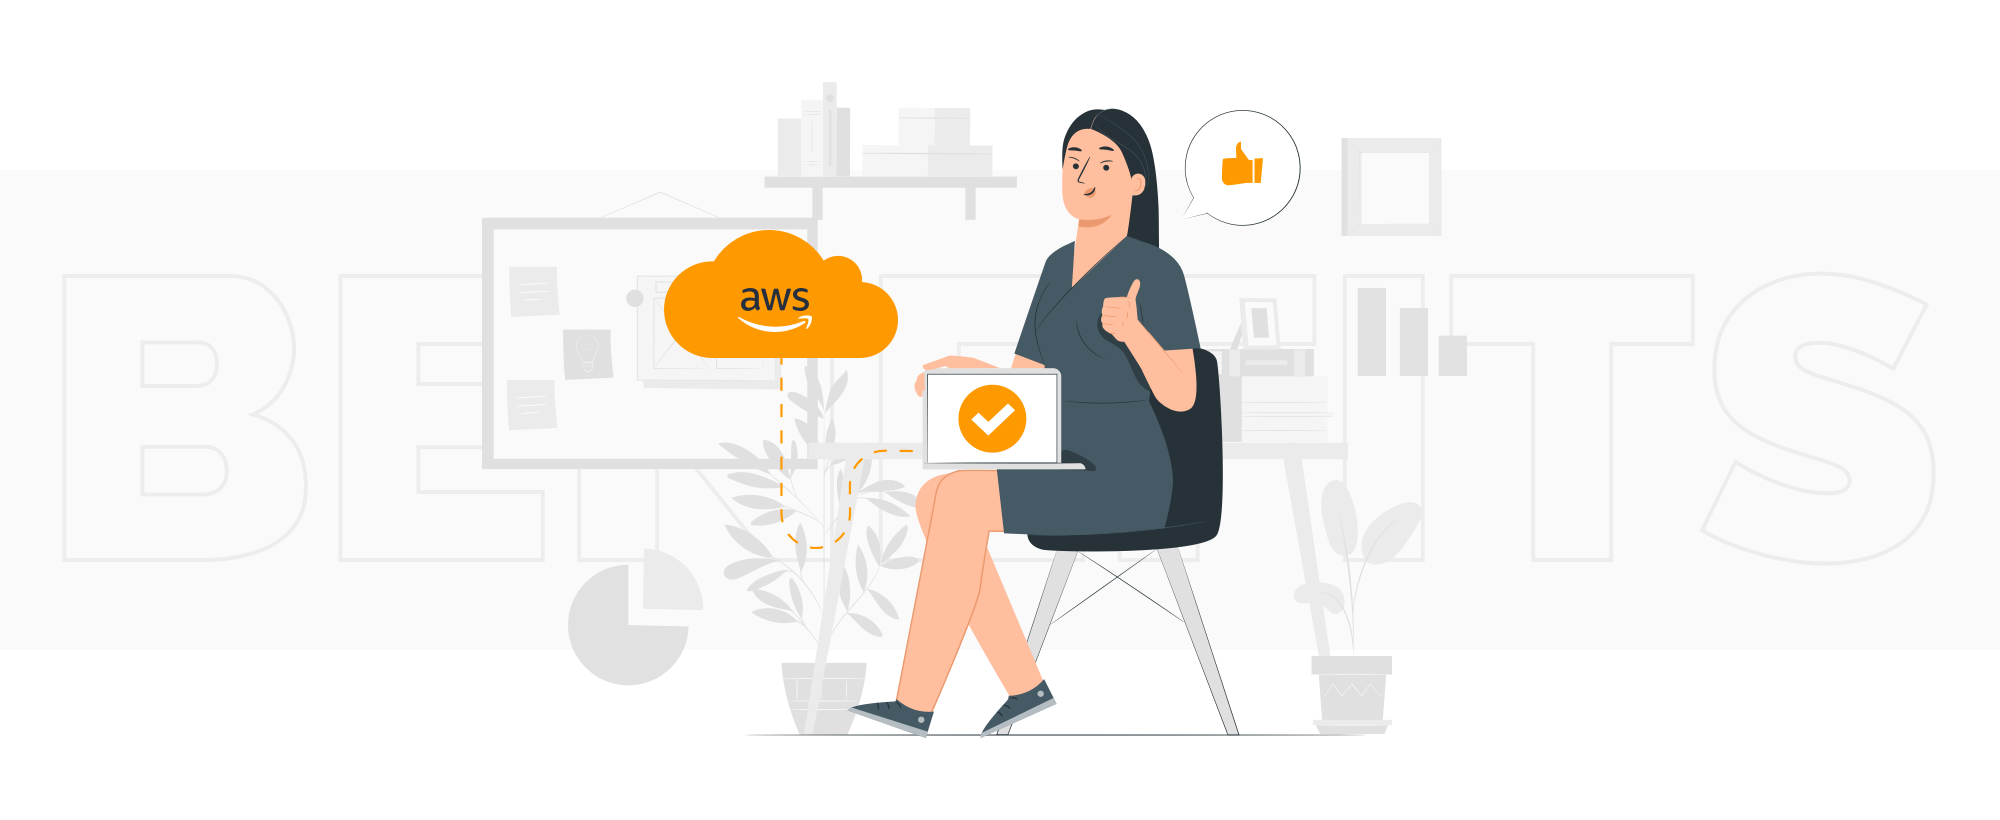 ISV Partner Path Benefits | TechMagic.co